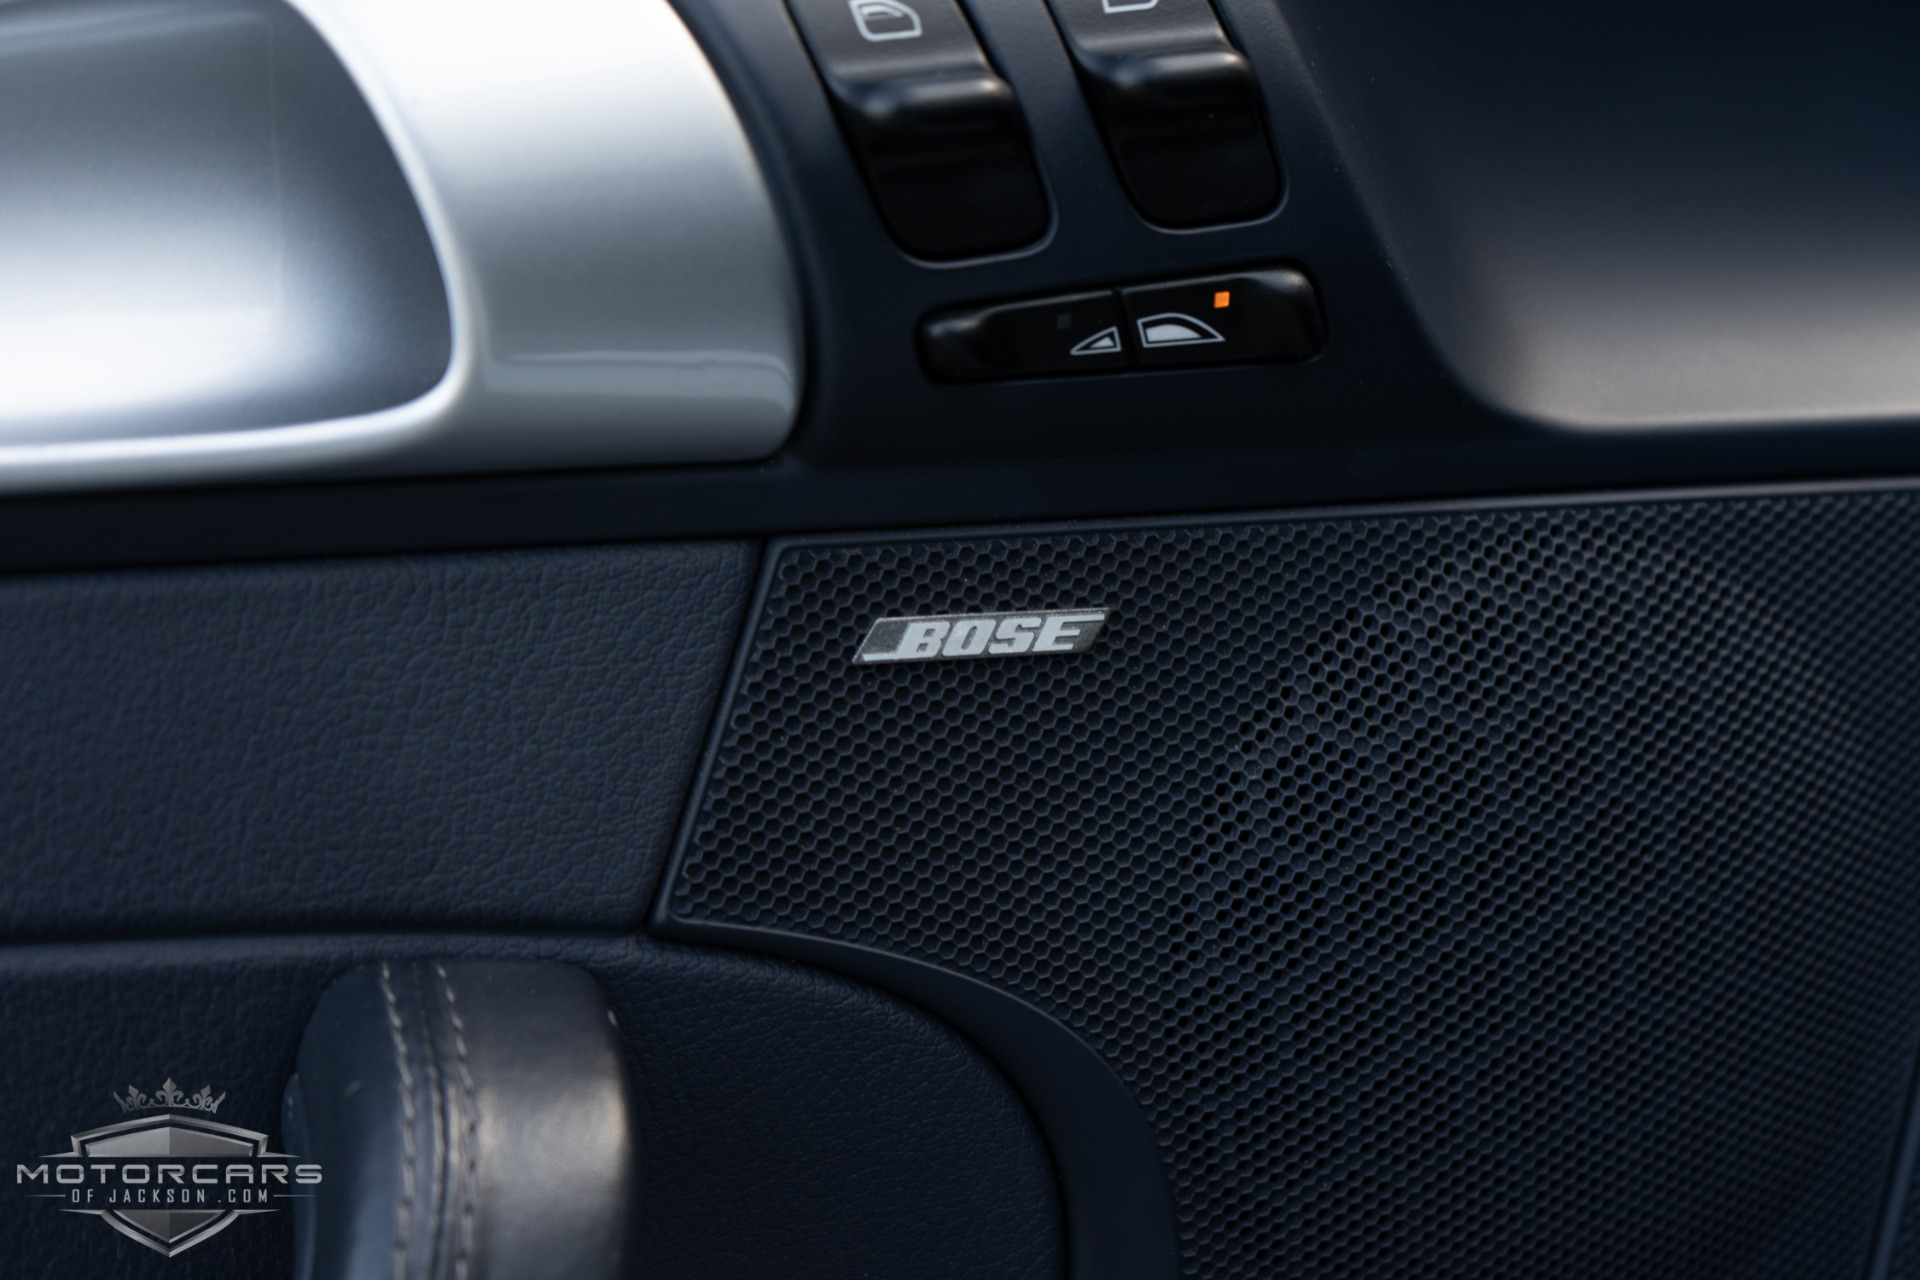 Used-2008-Porsche-911-Carrera-4S-Cabriolet-for-sale-Jackson-MS